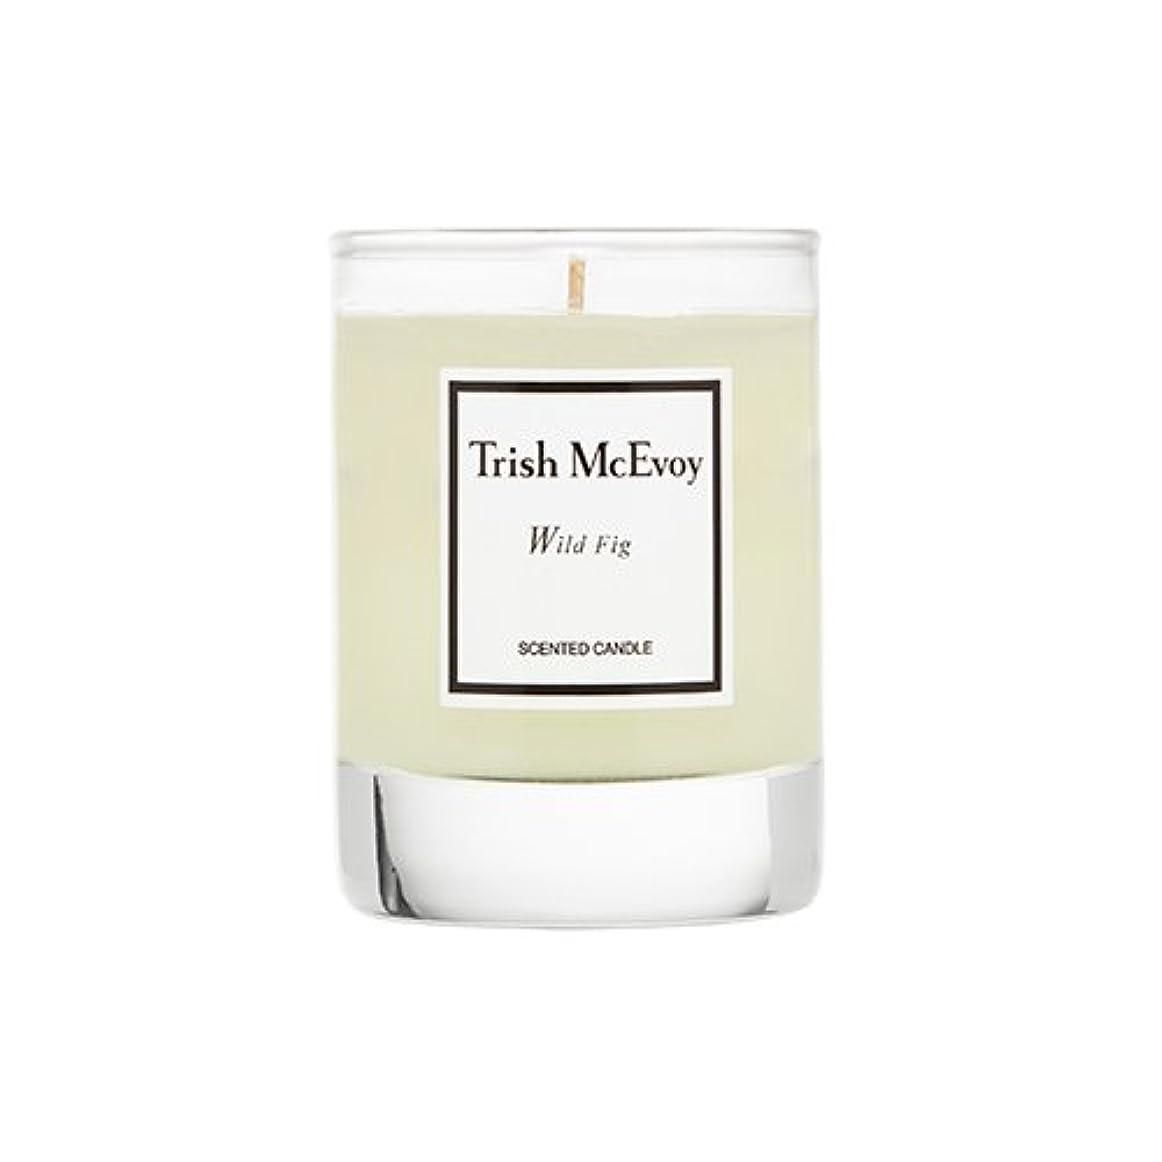 Trish McEvoy Wild Fig Scented Candle Votive 2oz